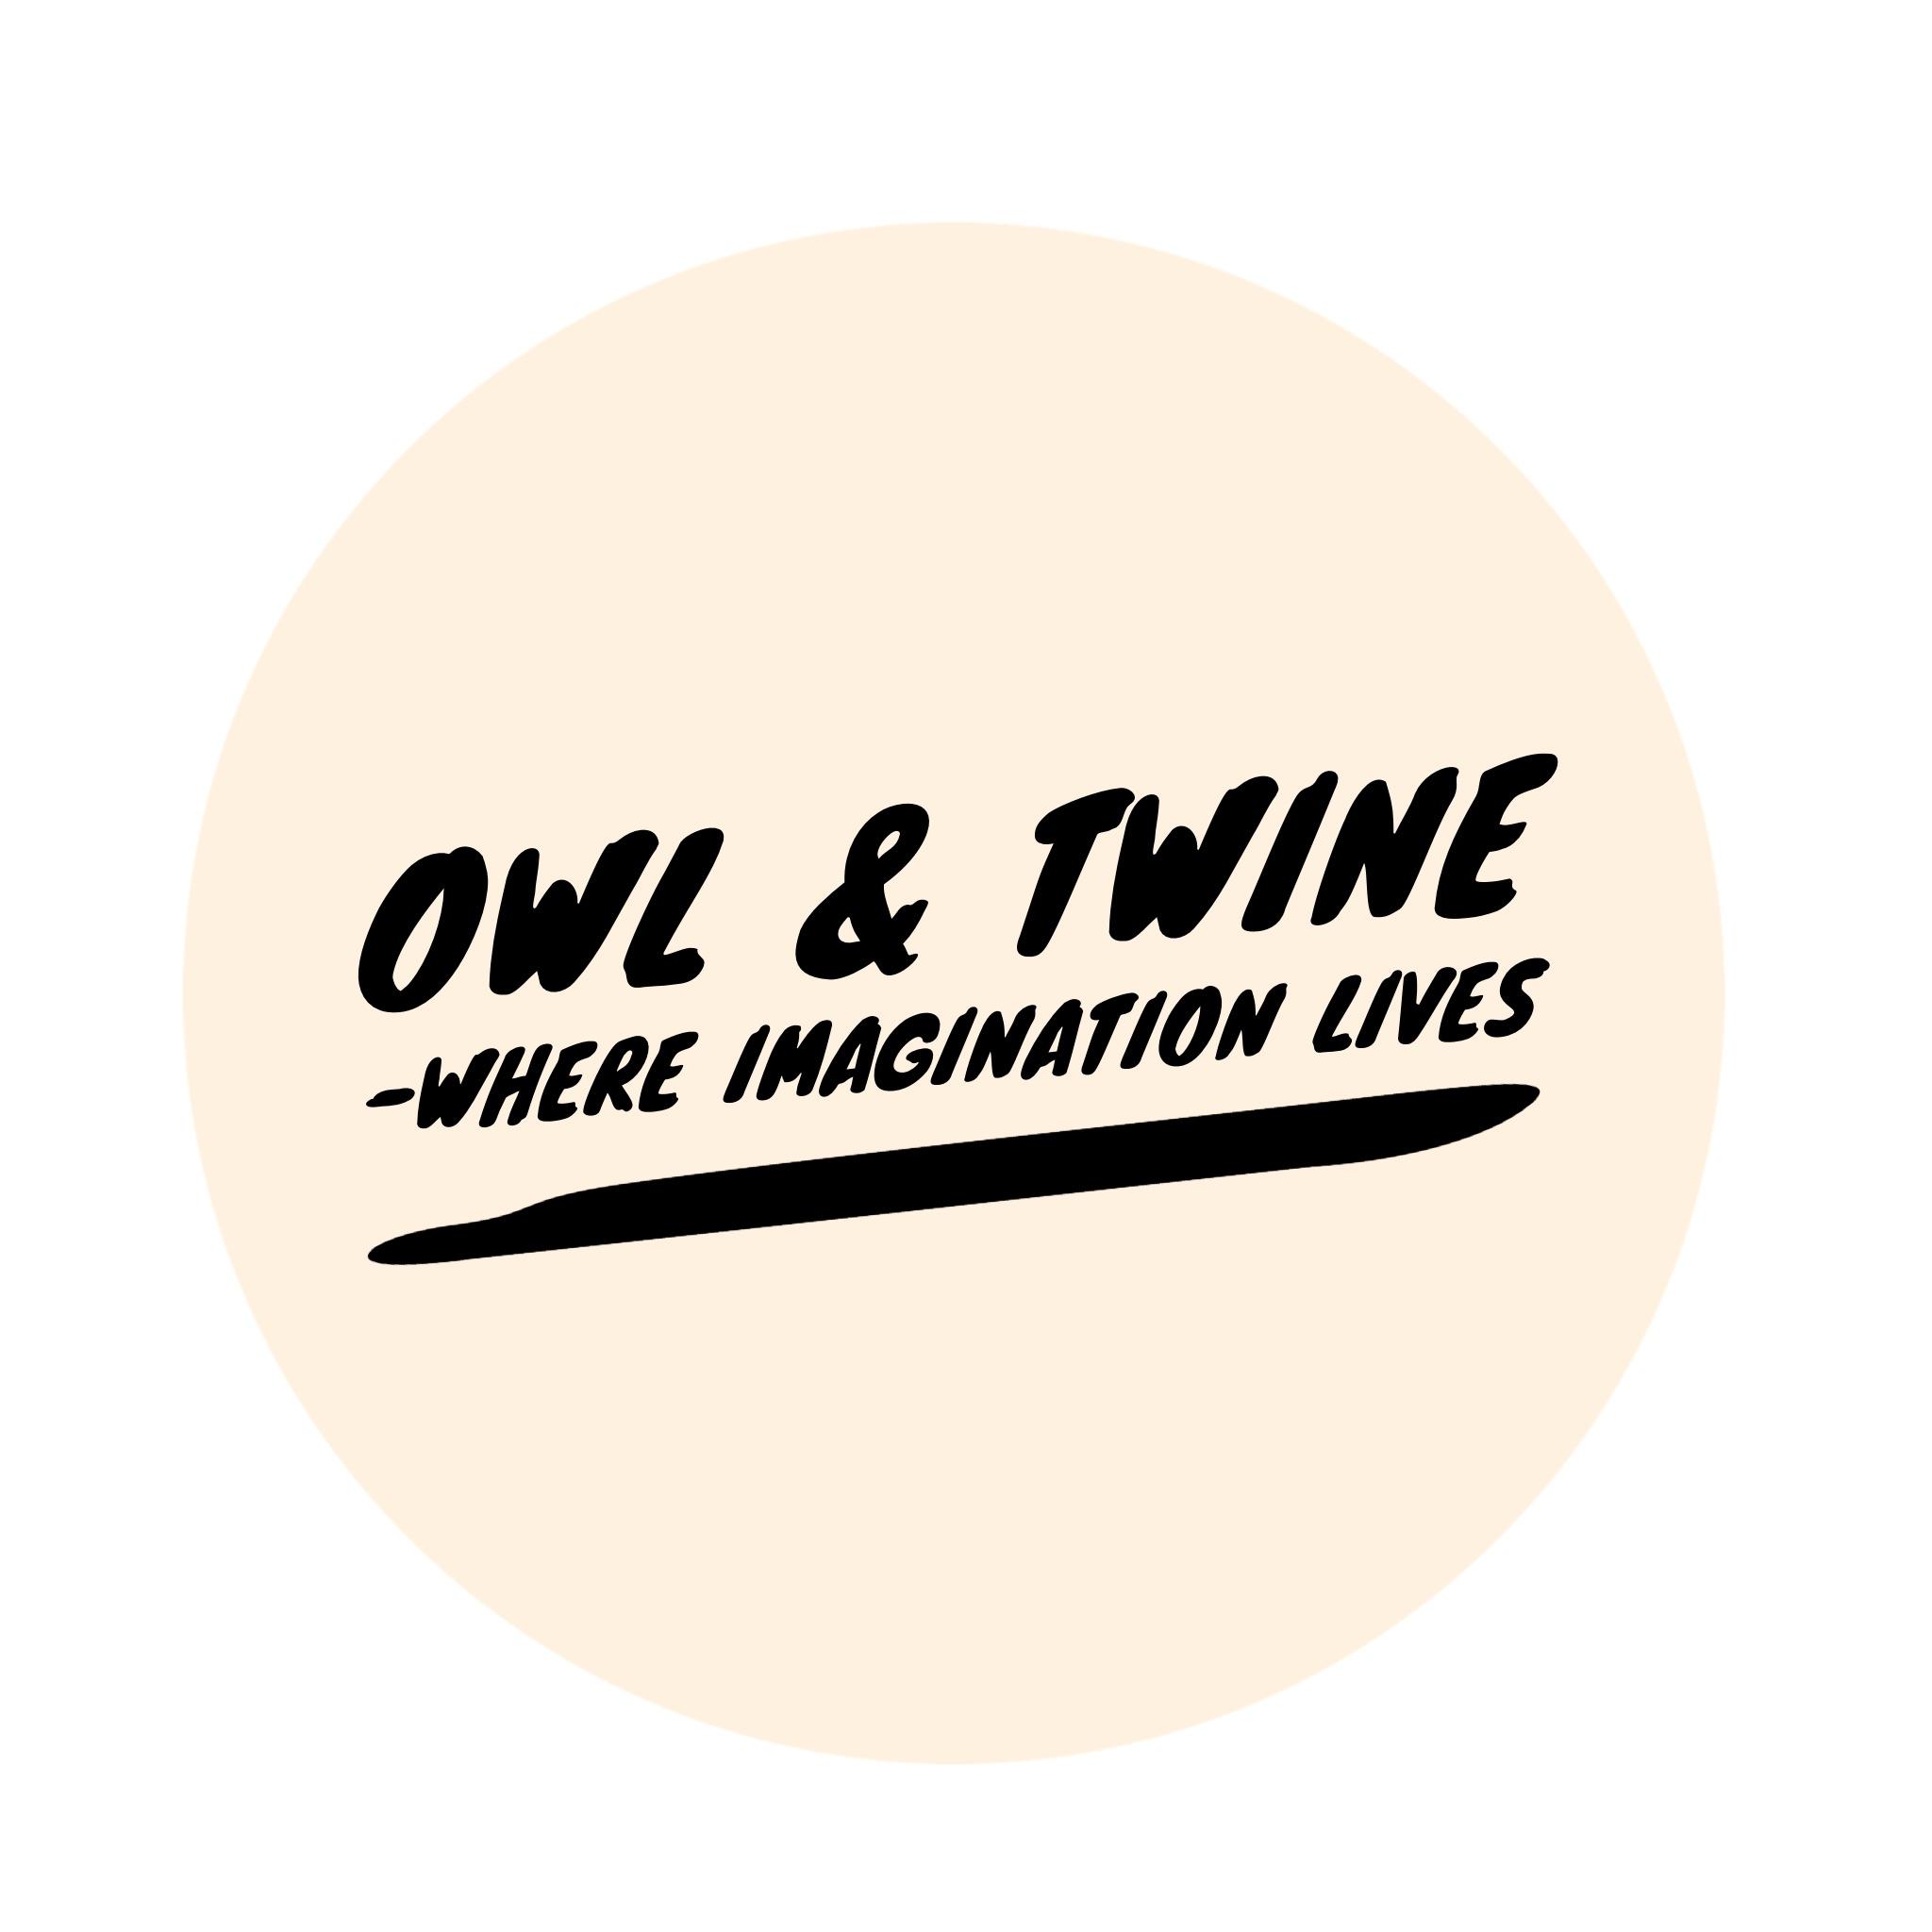 Owl an Twine Logo-kidlit-publishing.jpg